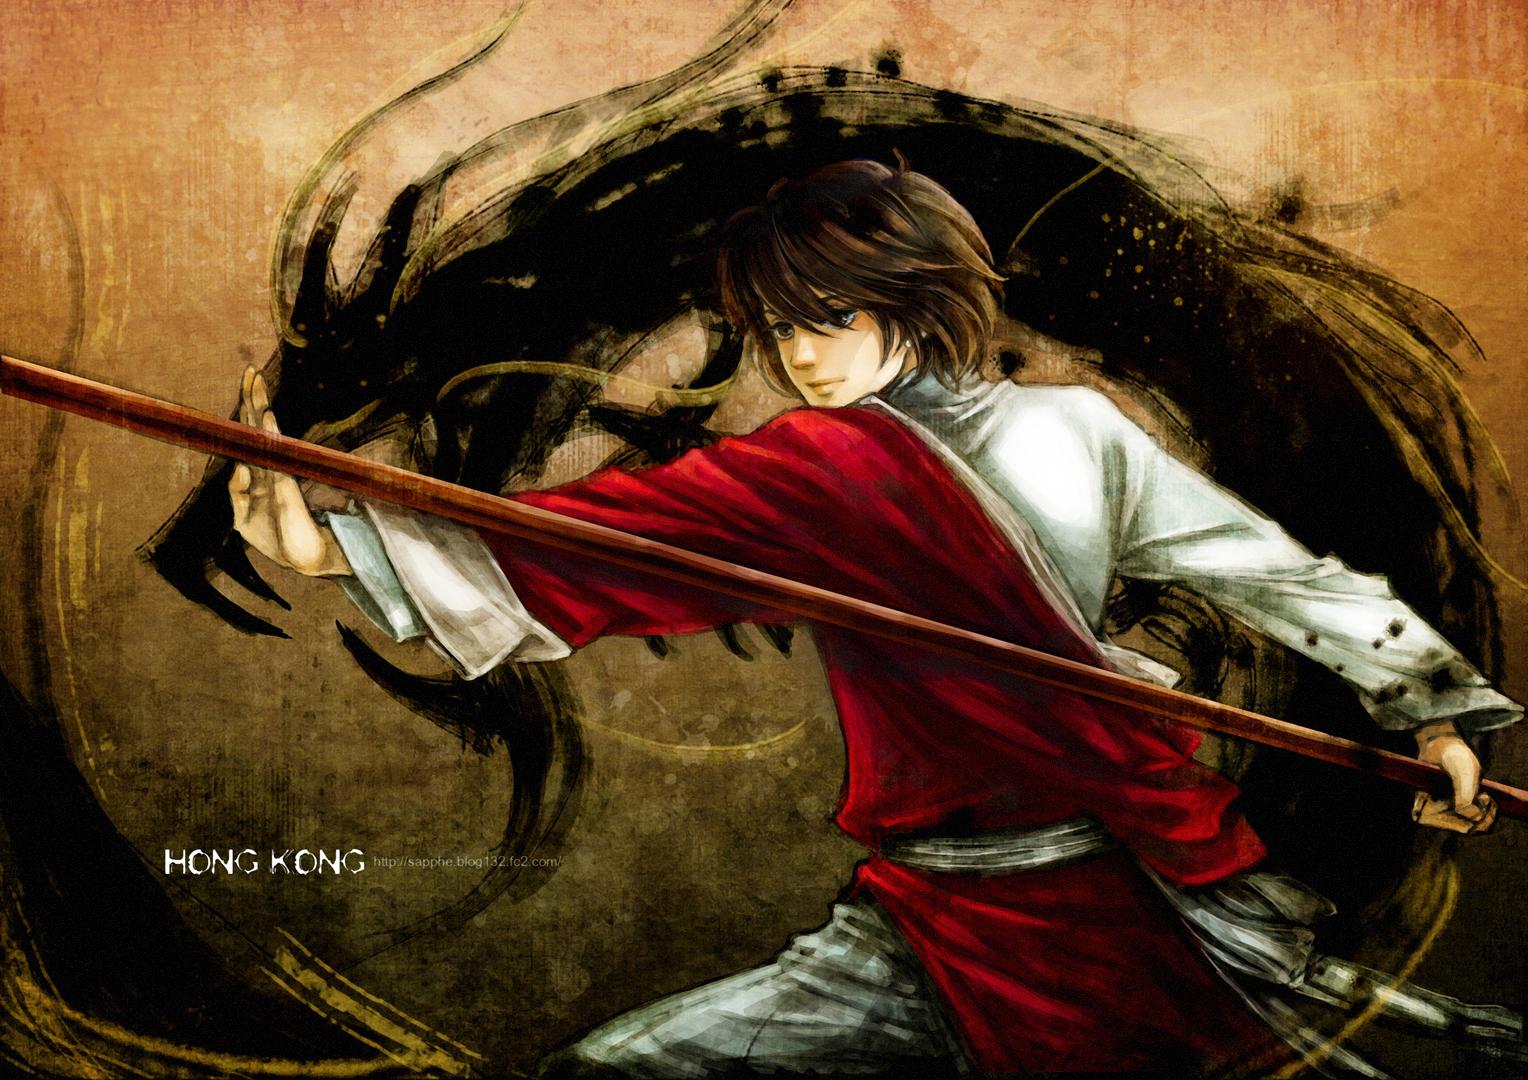 martial arts zerochan anime image board